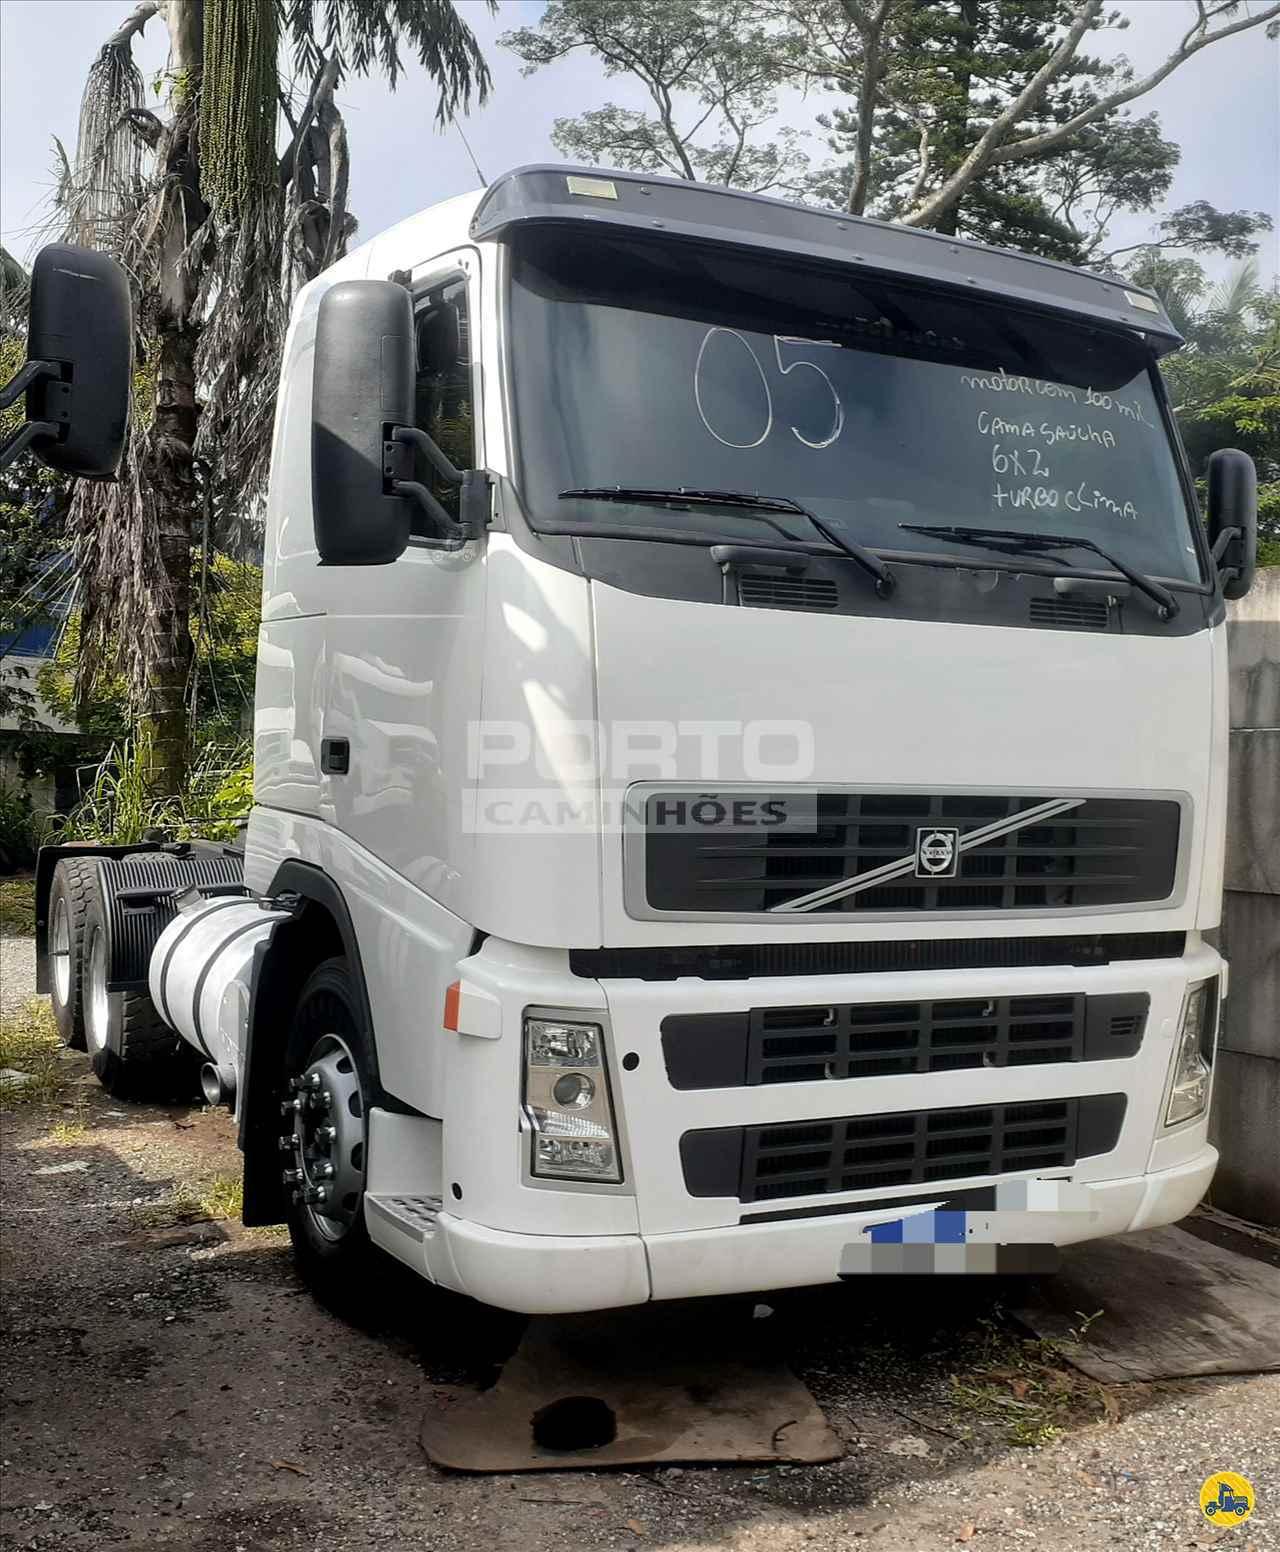 CAMINHAO VOLVO VOLVO FH12 380 Cavalo Mecânico Truck 6x2 Porto Caminhões GUARULHOS SÃO PAULO SP